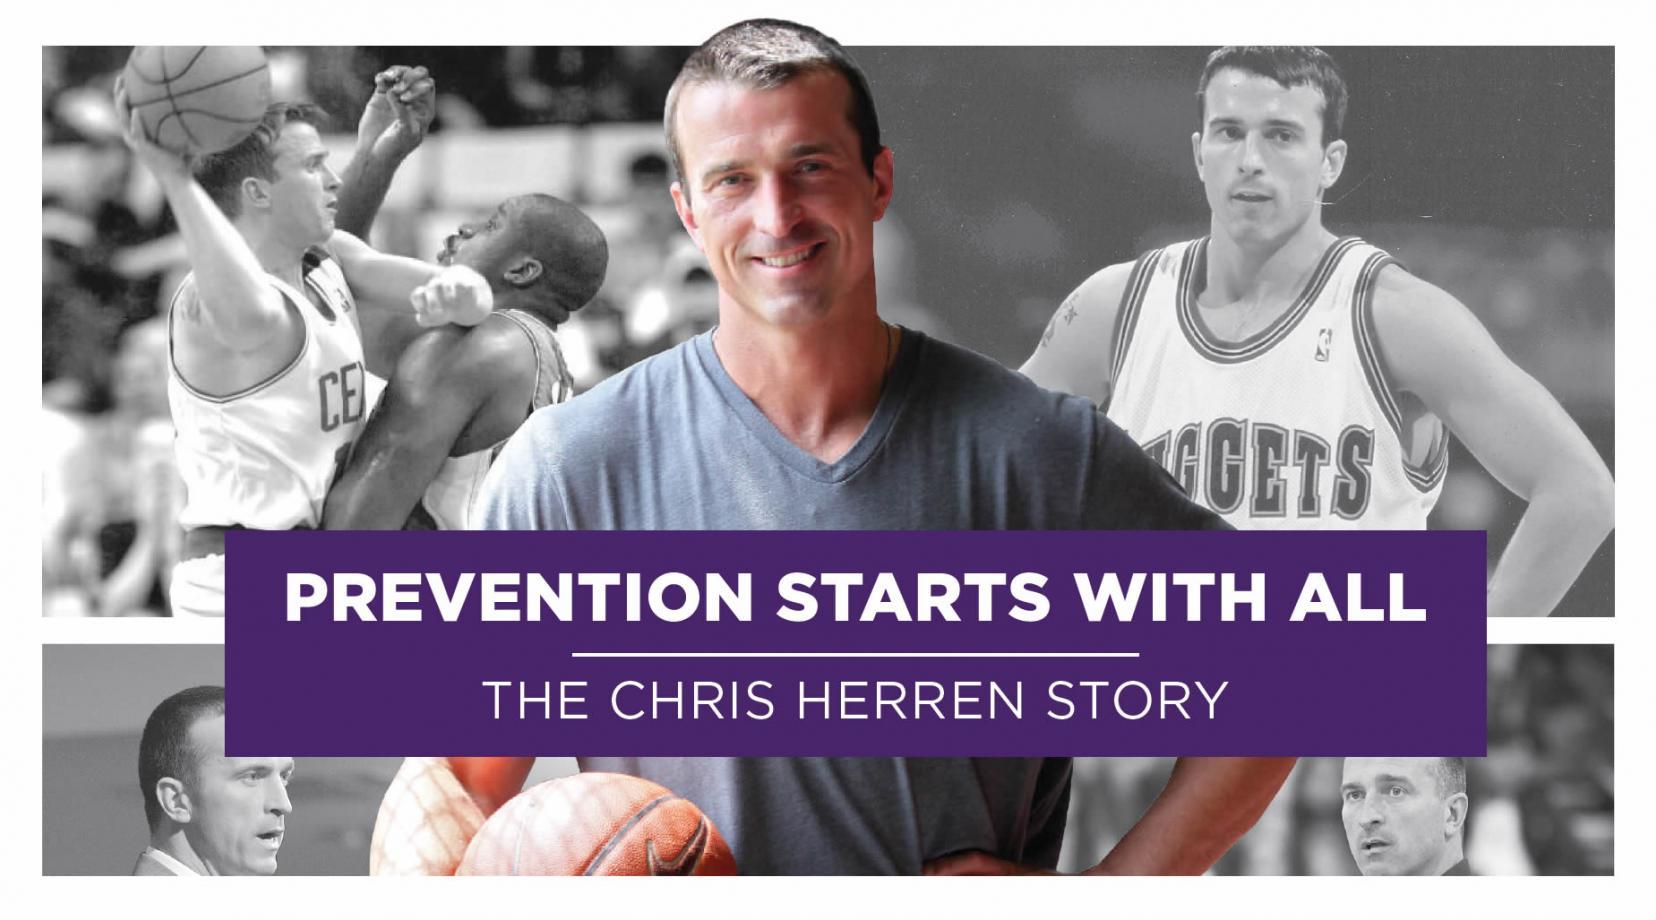 The Chris Herren Story